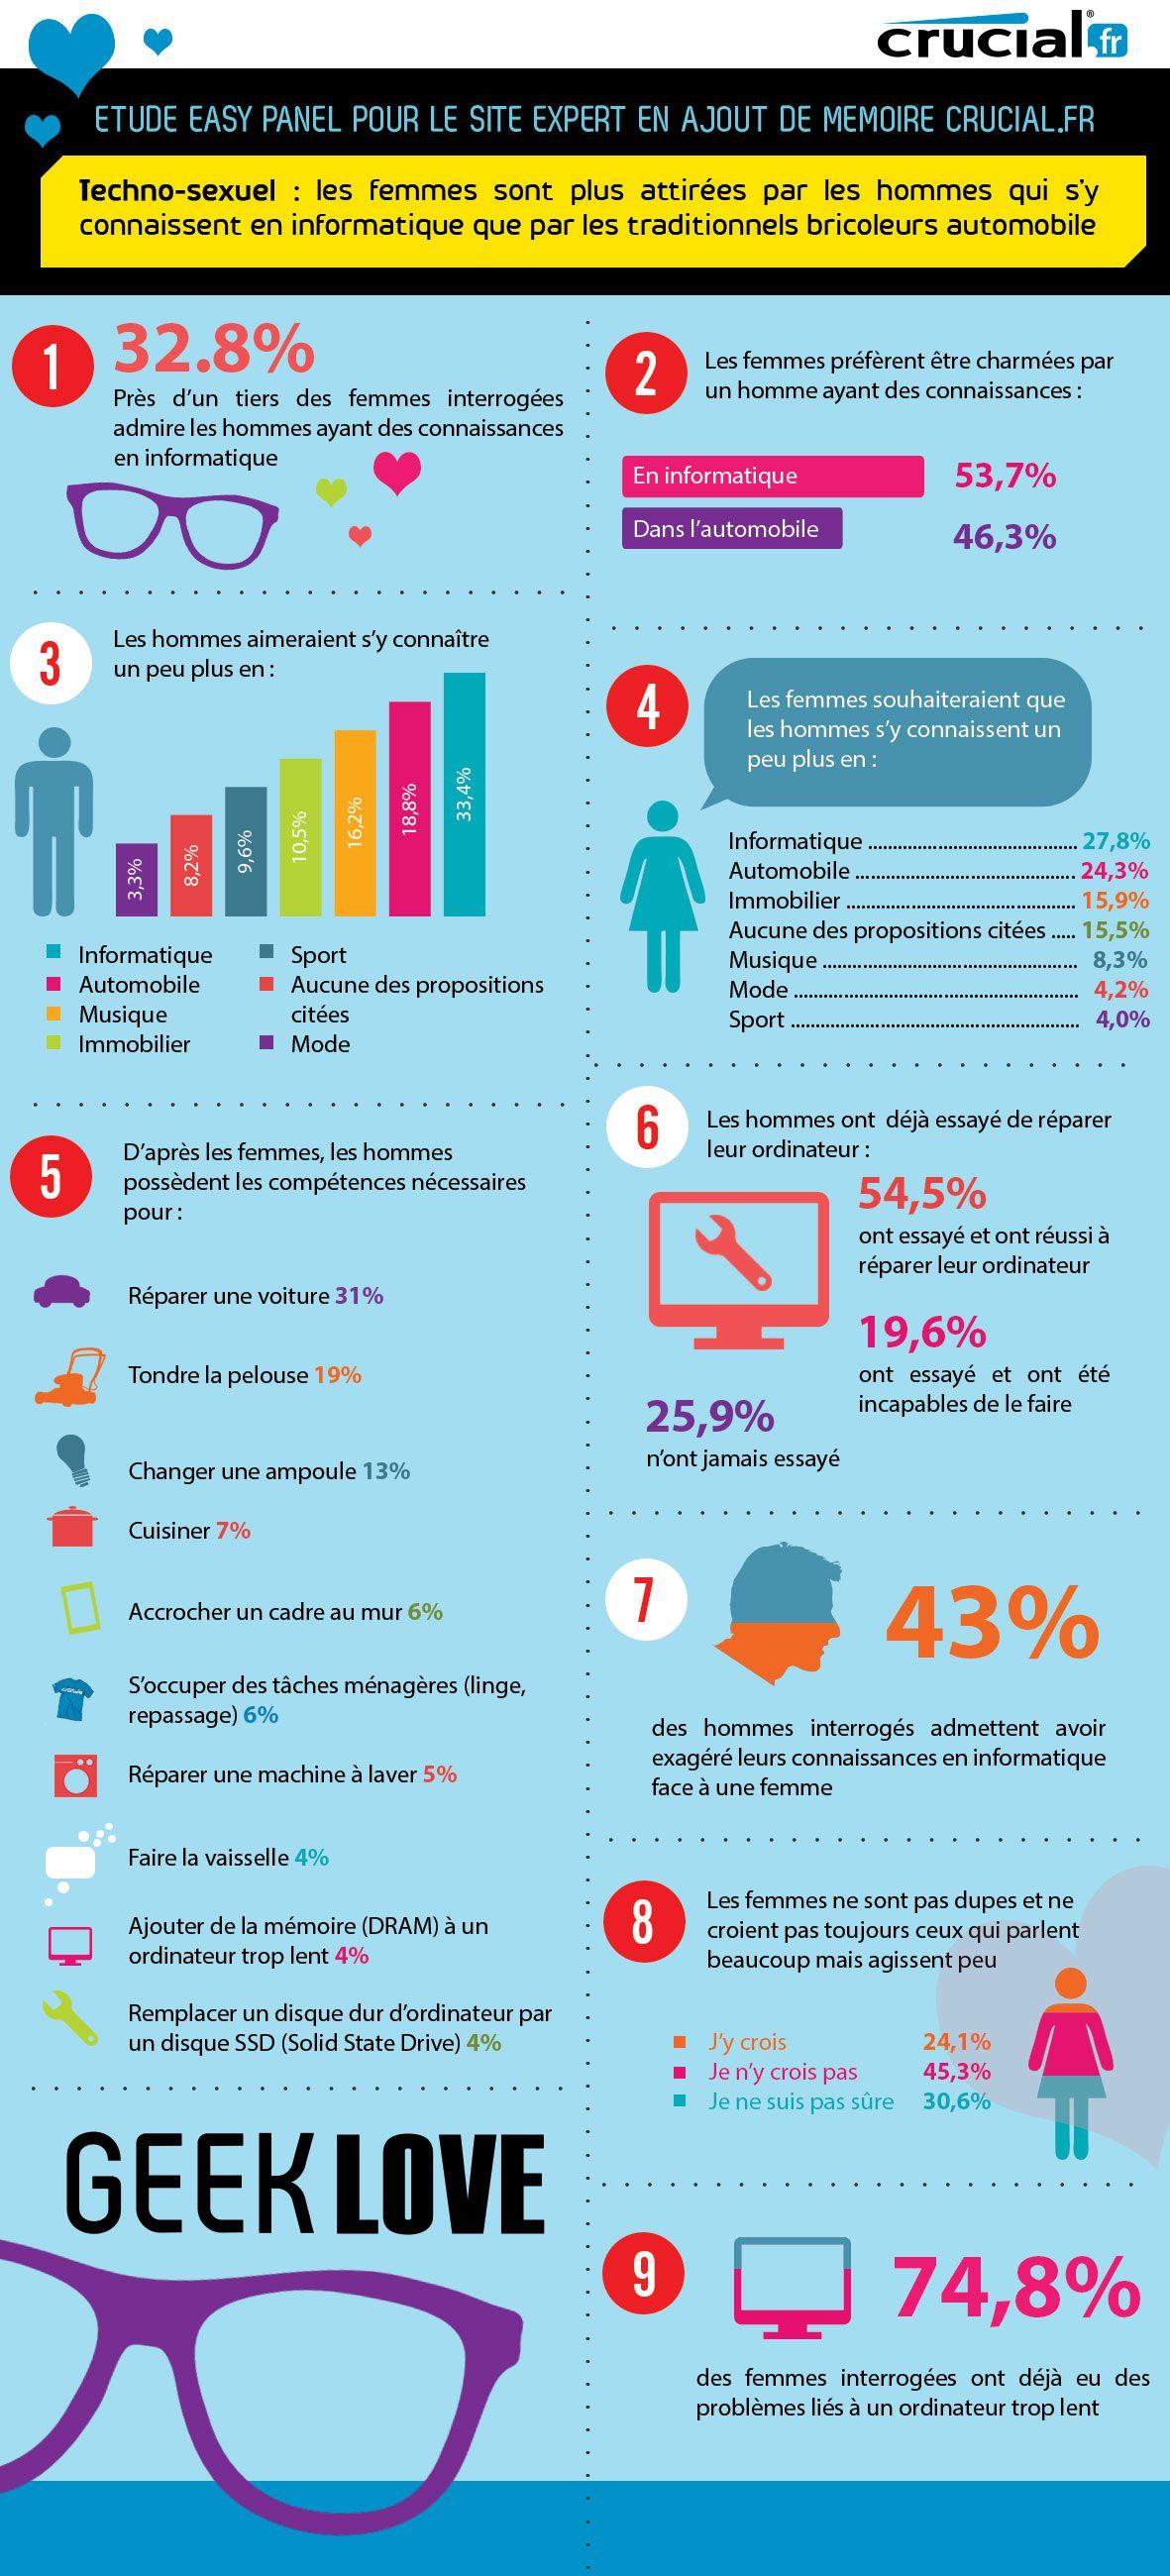 Infographie-Crucial.fr-Techno-attirance-210513-1